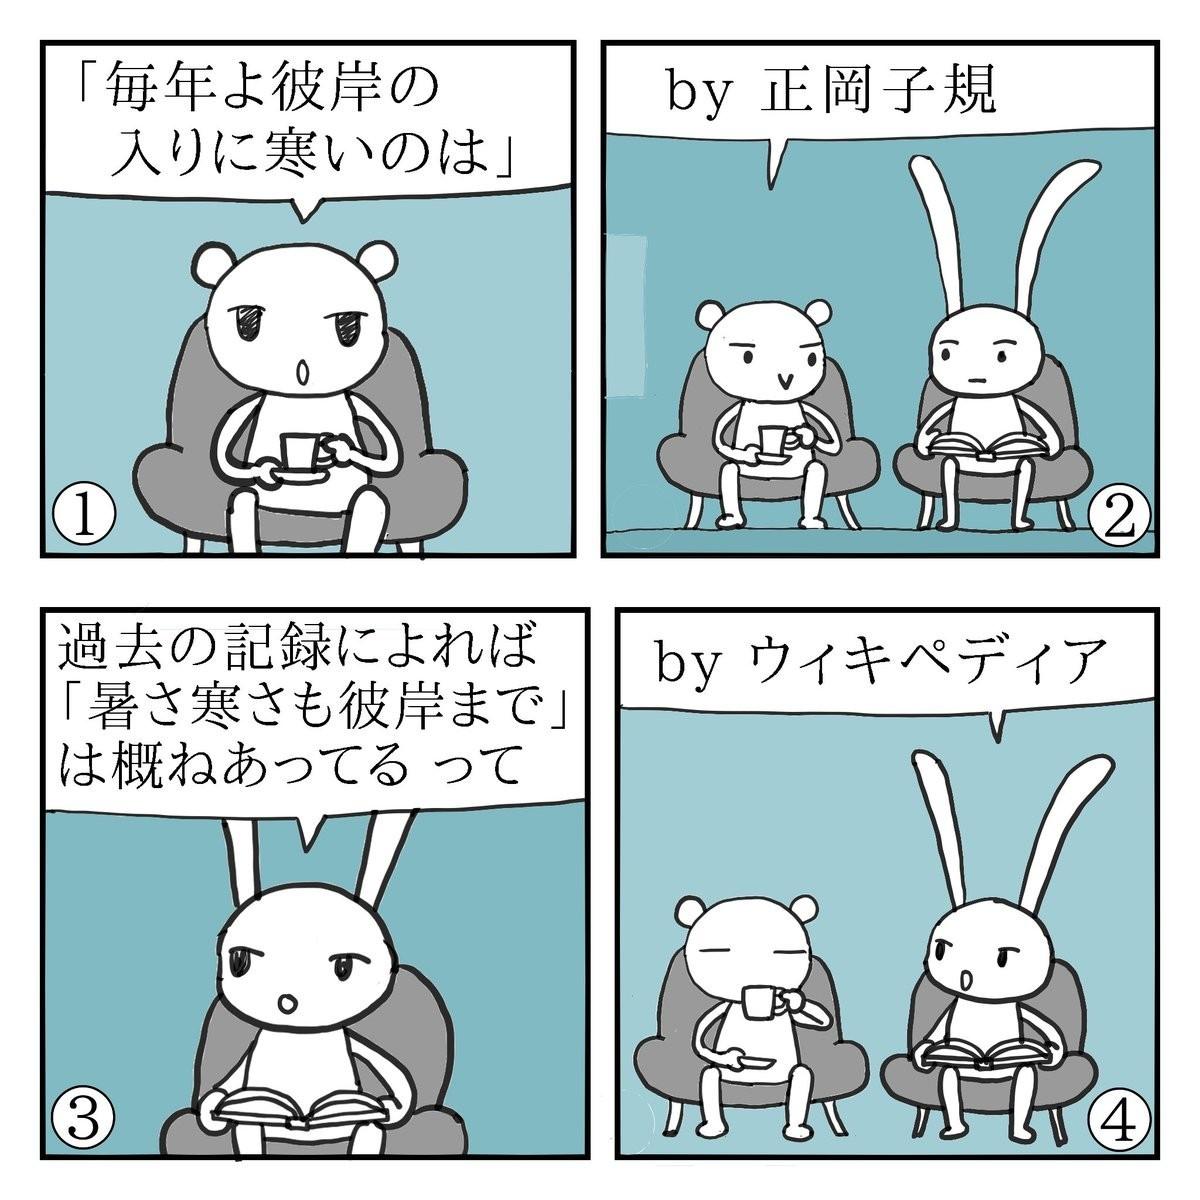 f:id:kanarihikokuma:20190318065435j:image:w330